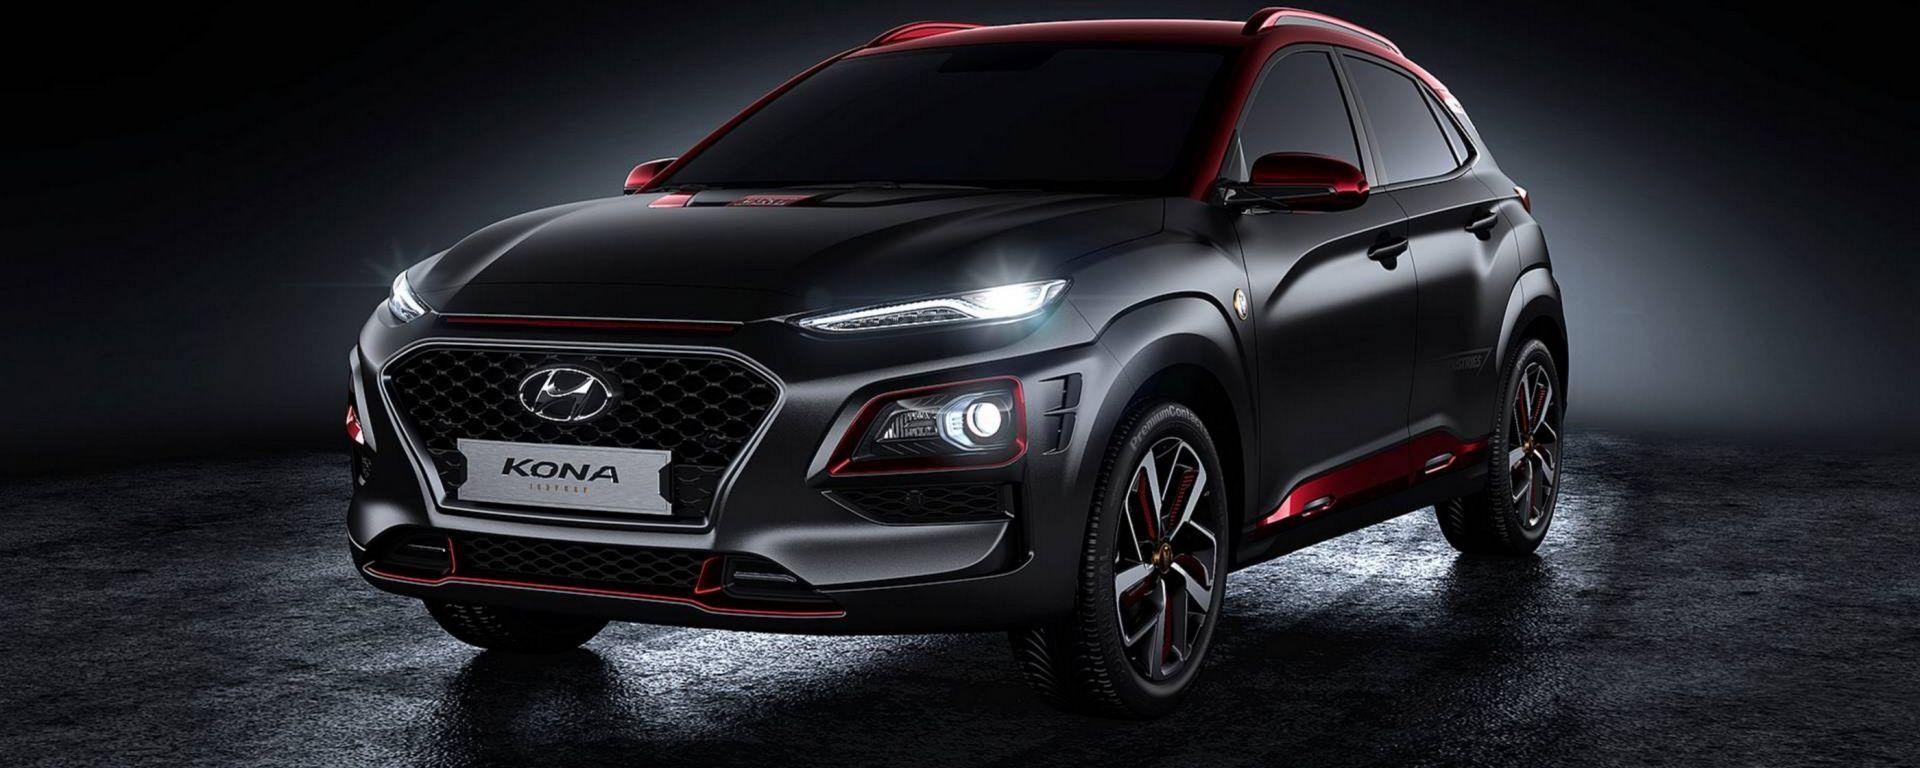 Hyundai Kona Iron Man Edition: il SUV da supereroe